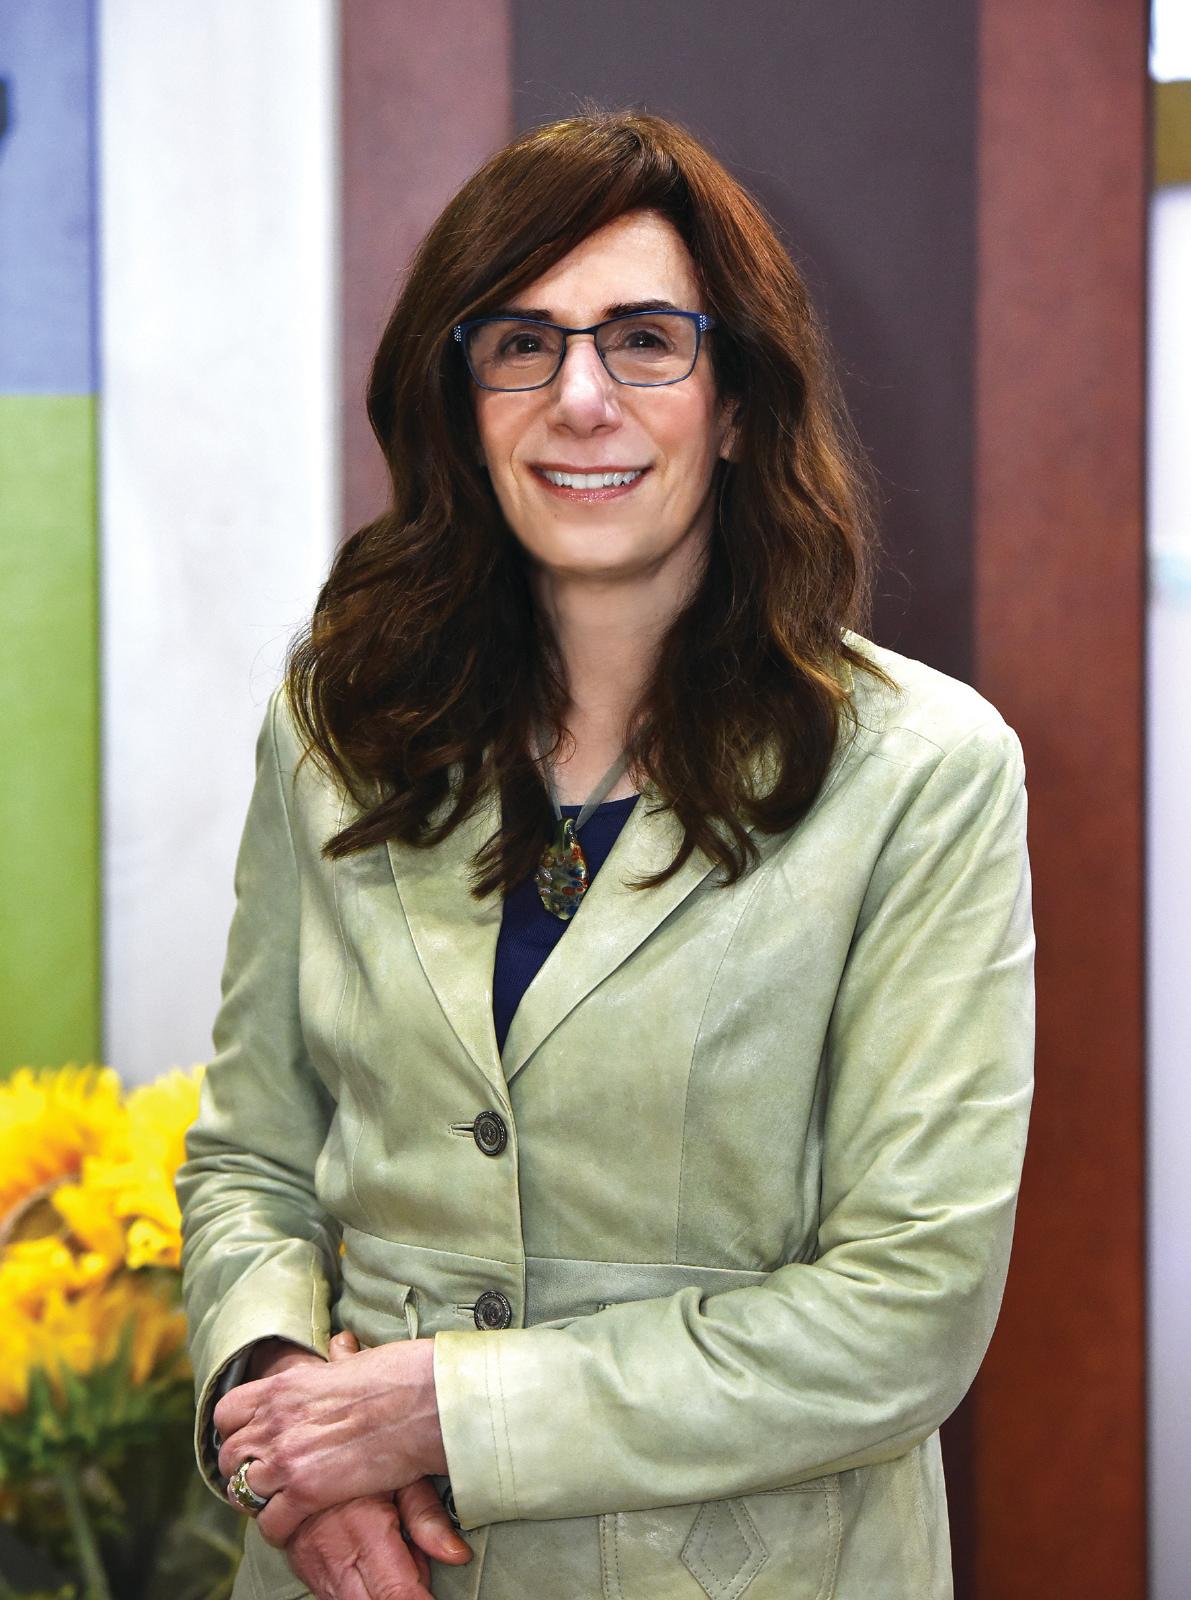 profile photo of Judy Faulkner